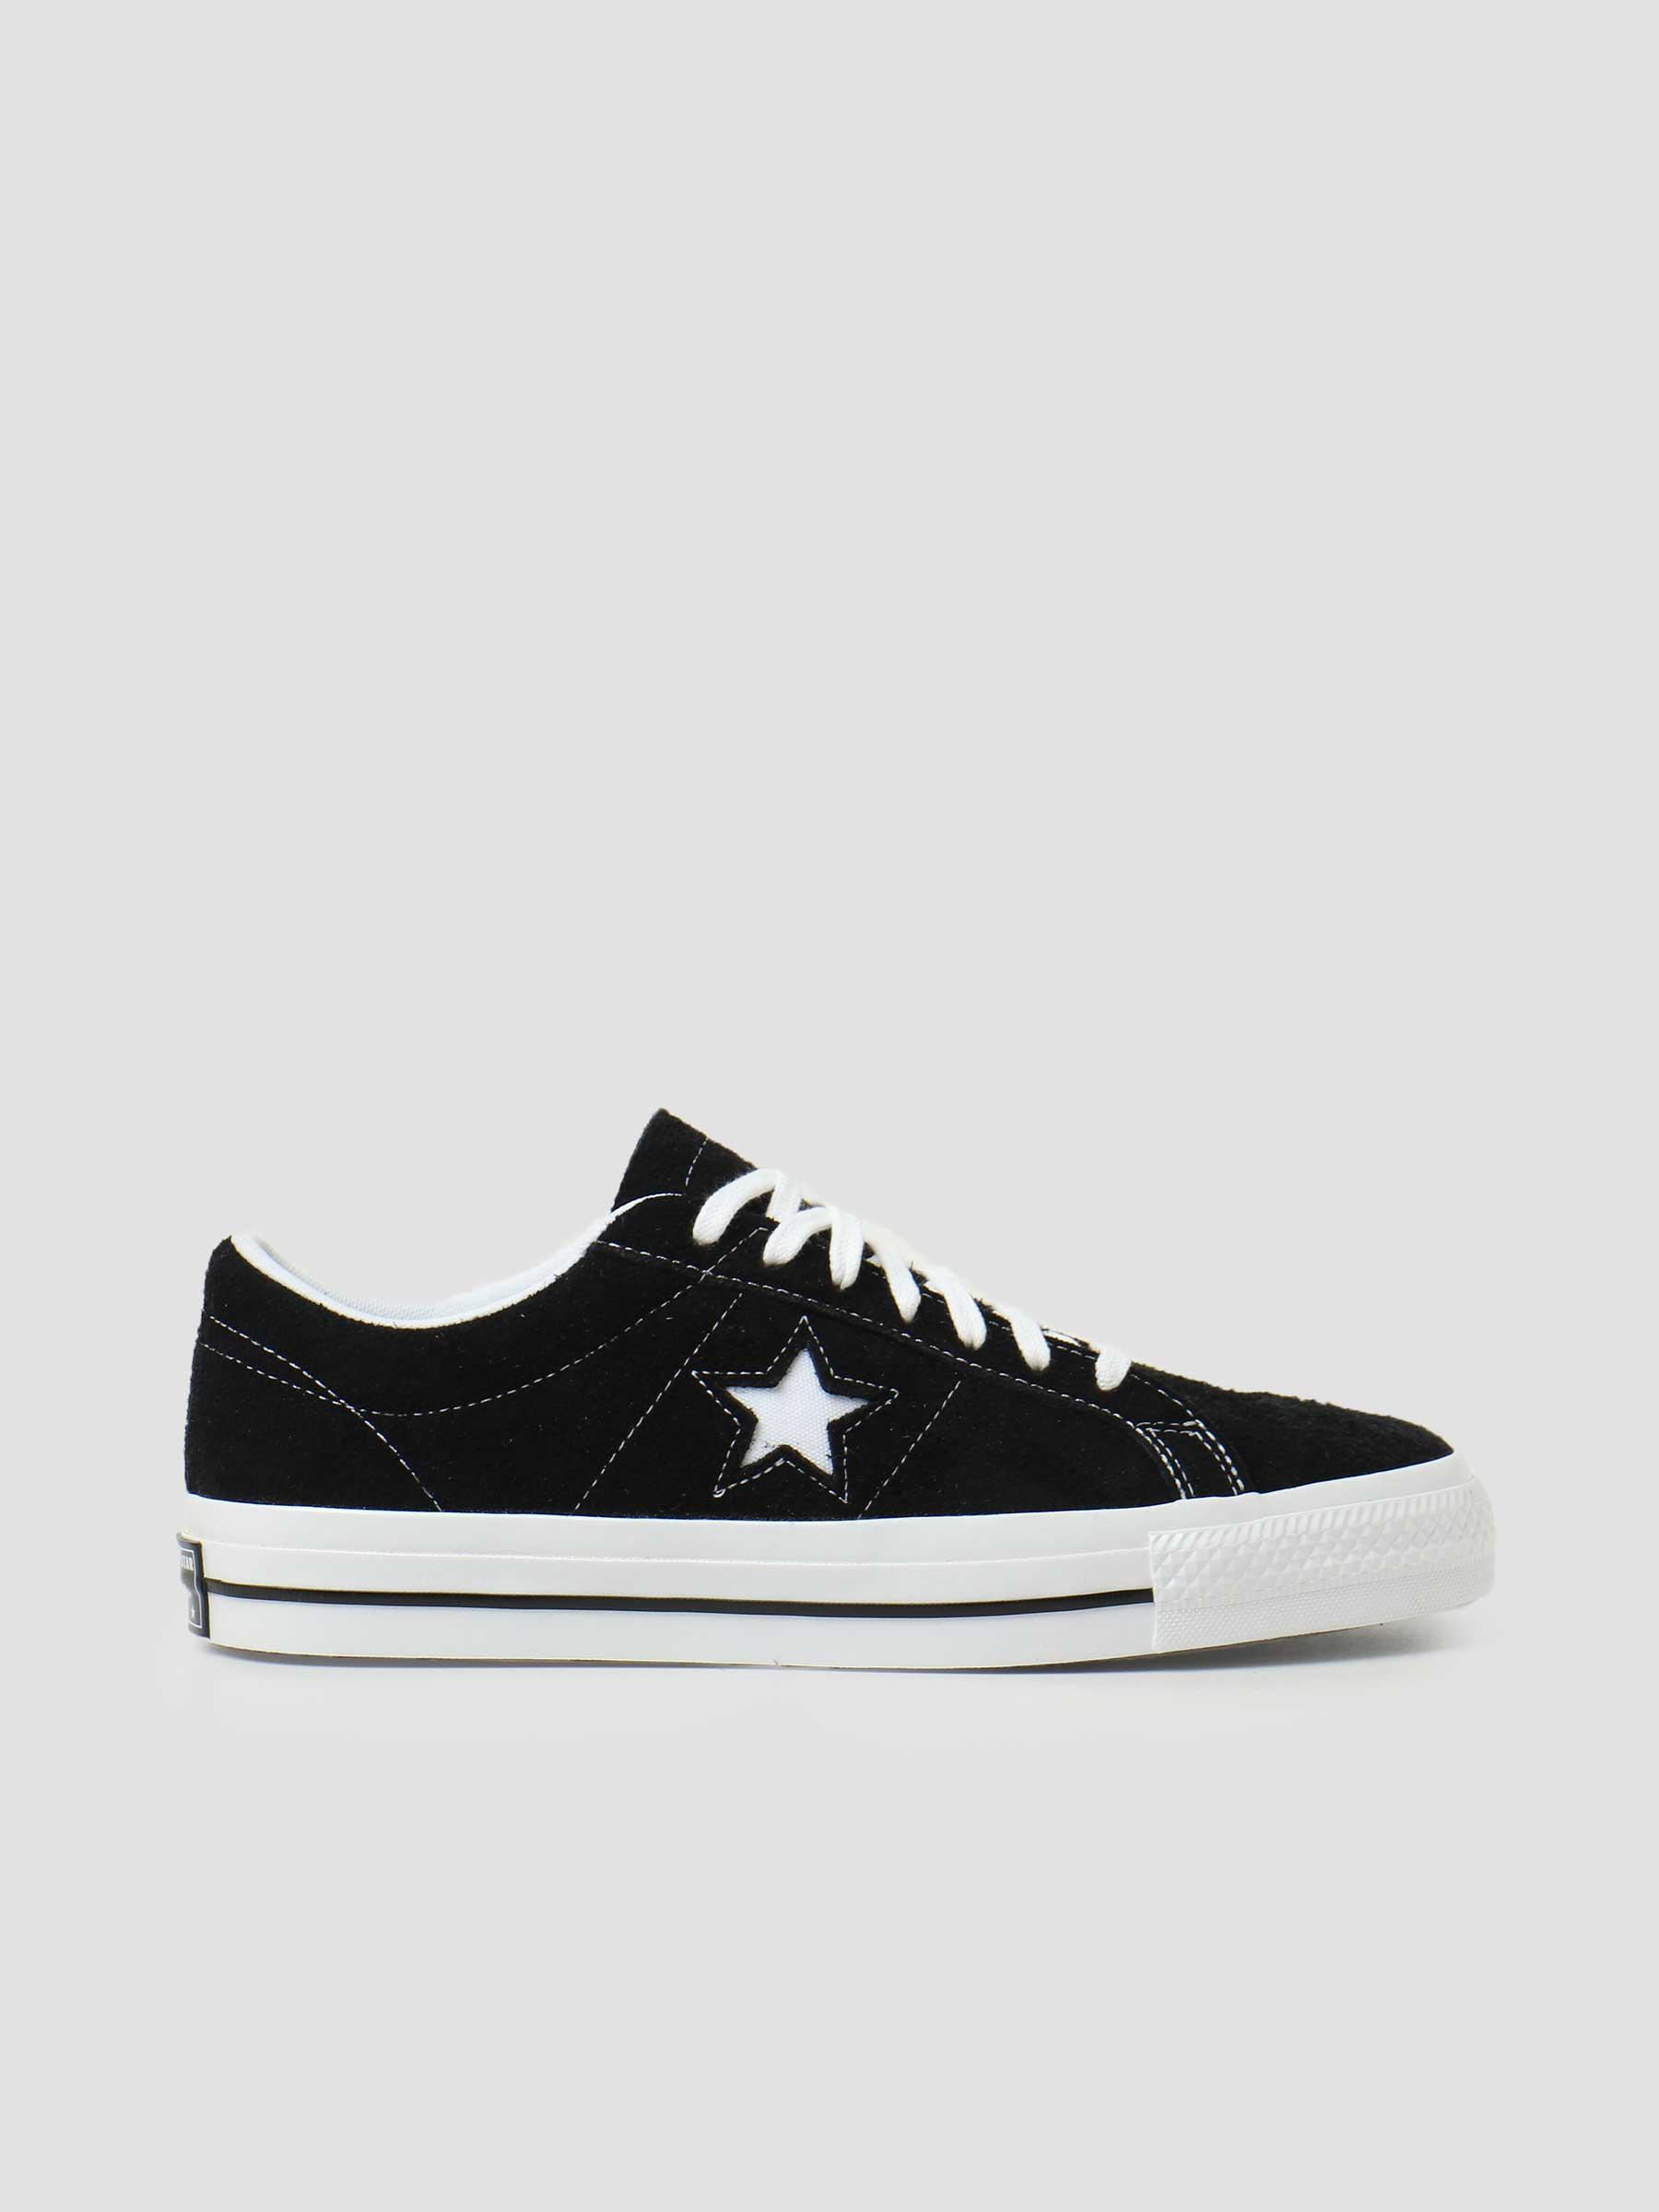 One Star OX Black Black White 171587C